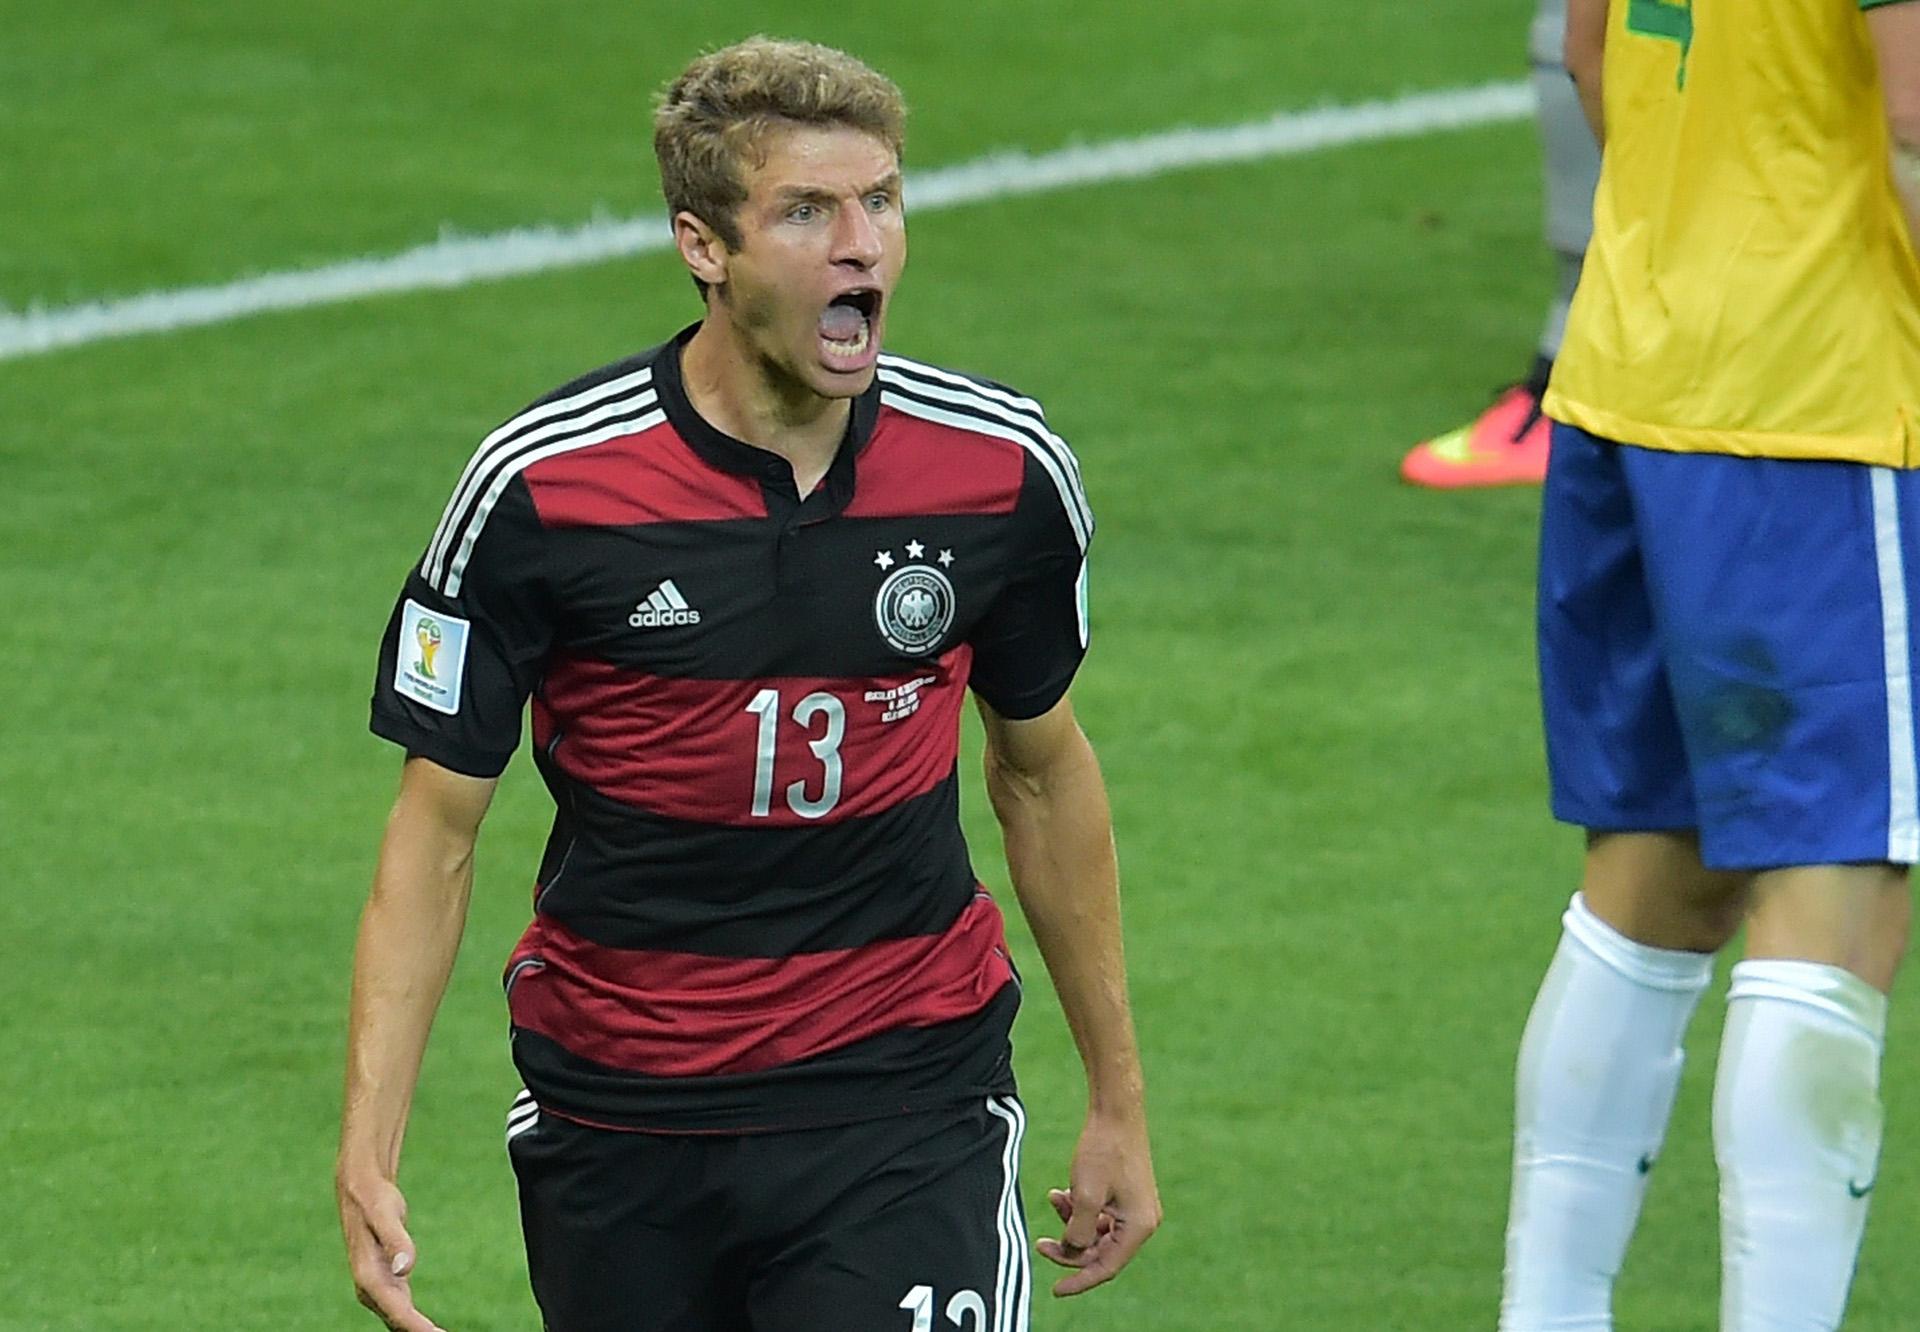 Thomas Muller Brazil Germany 2014 World Cup quarter-final 07082014